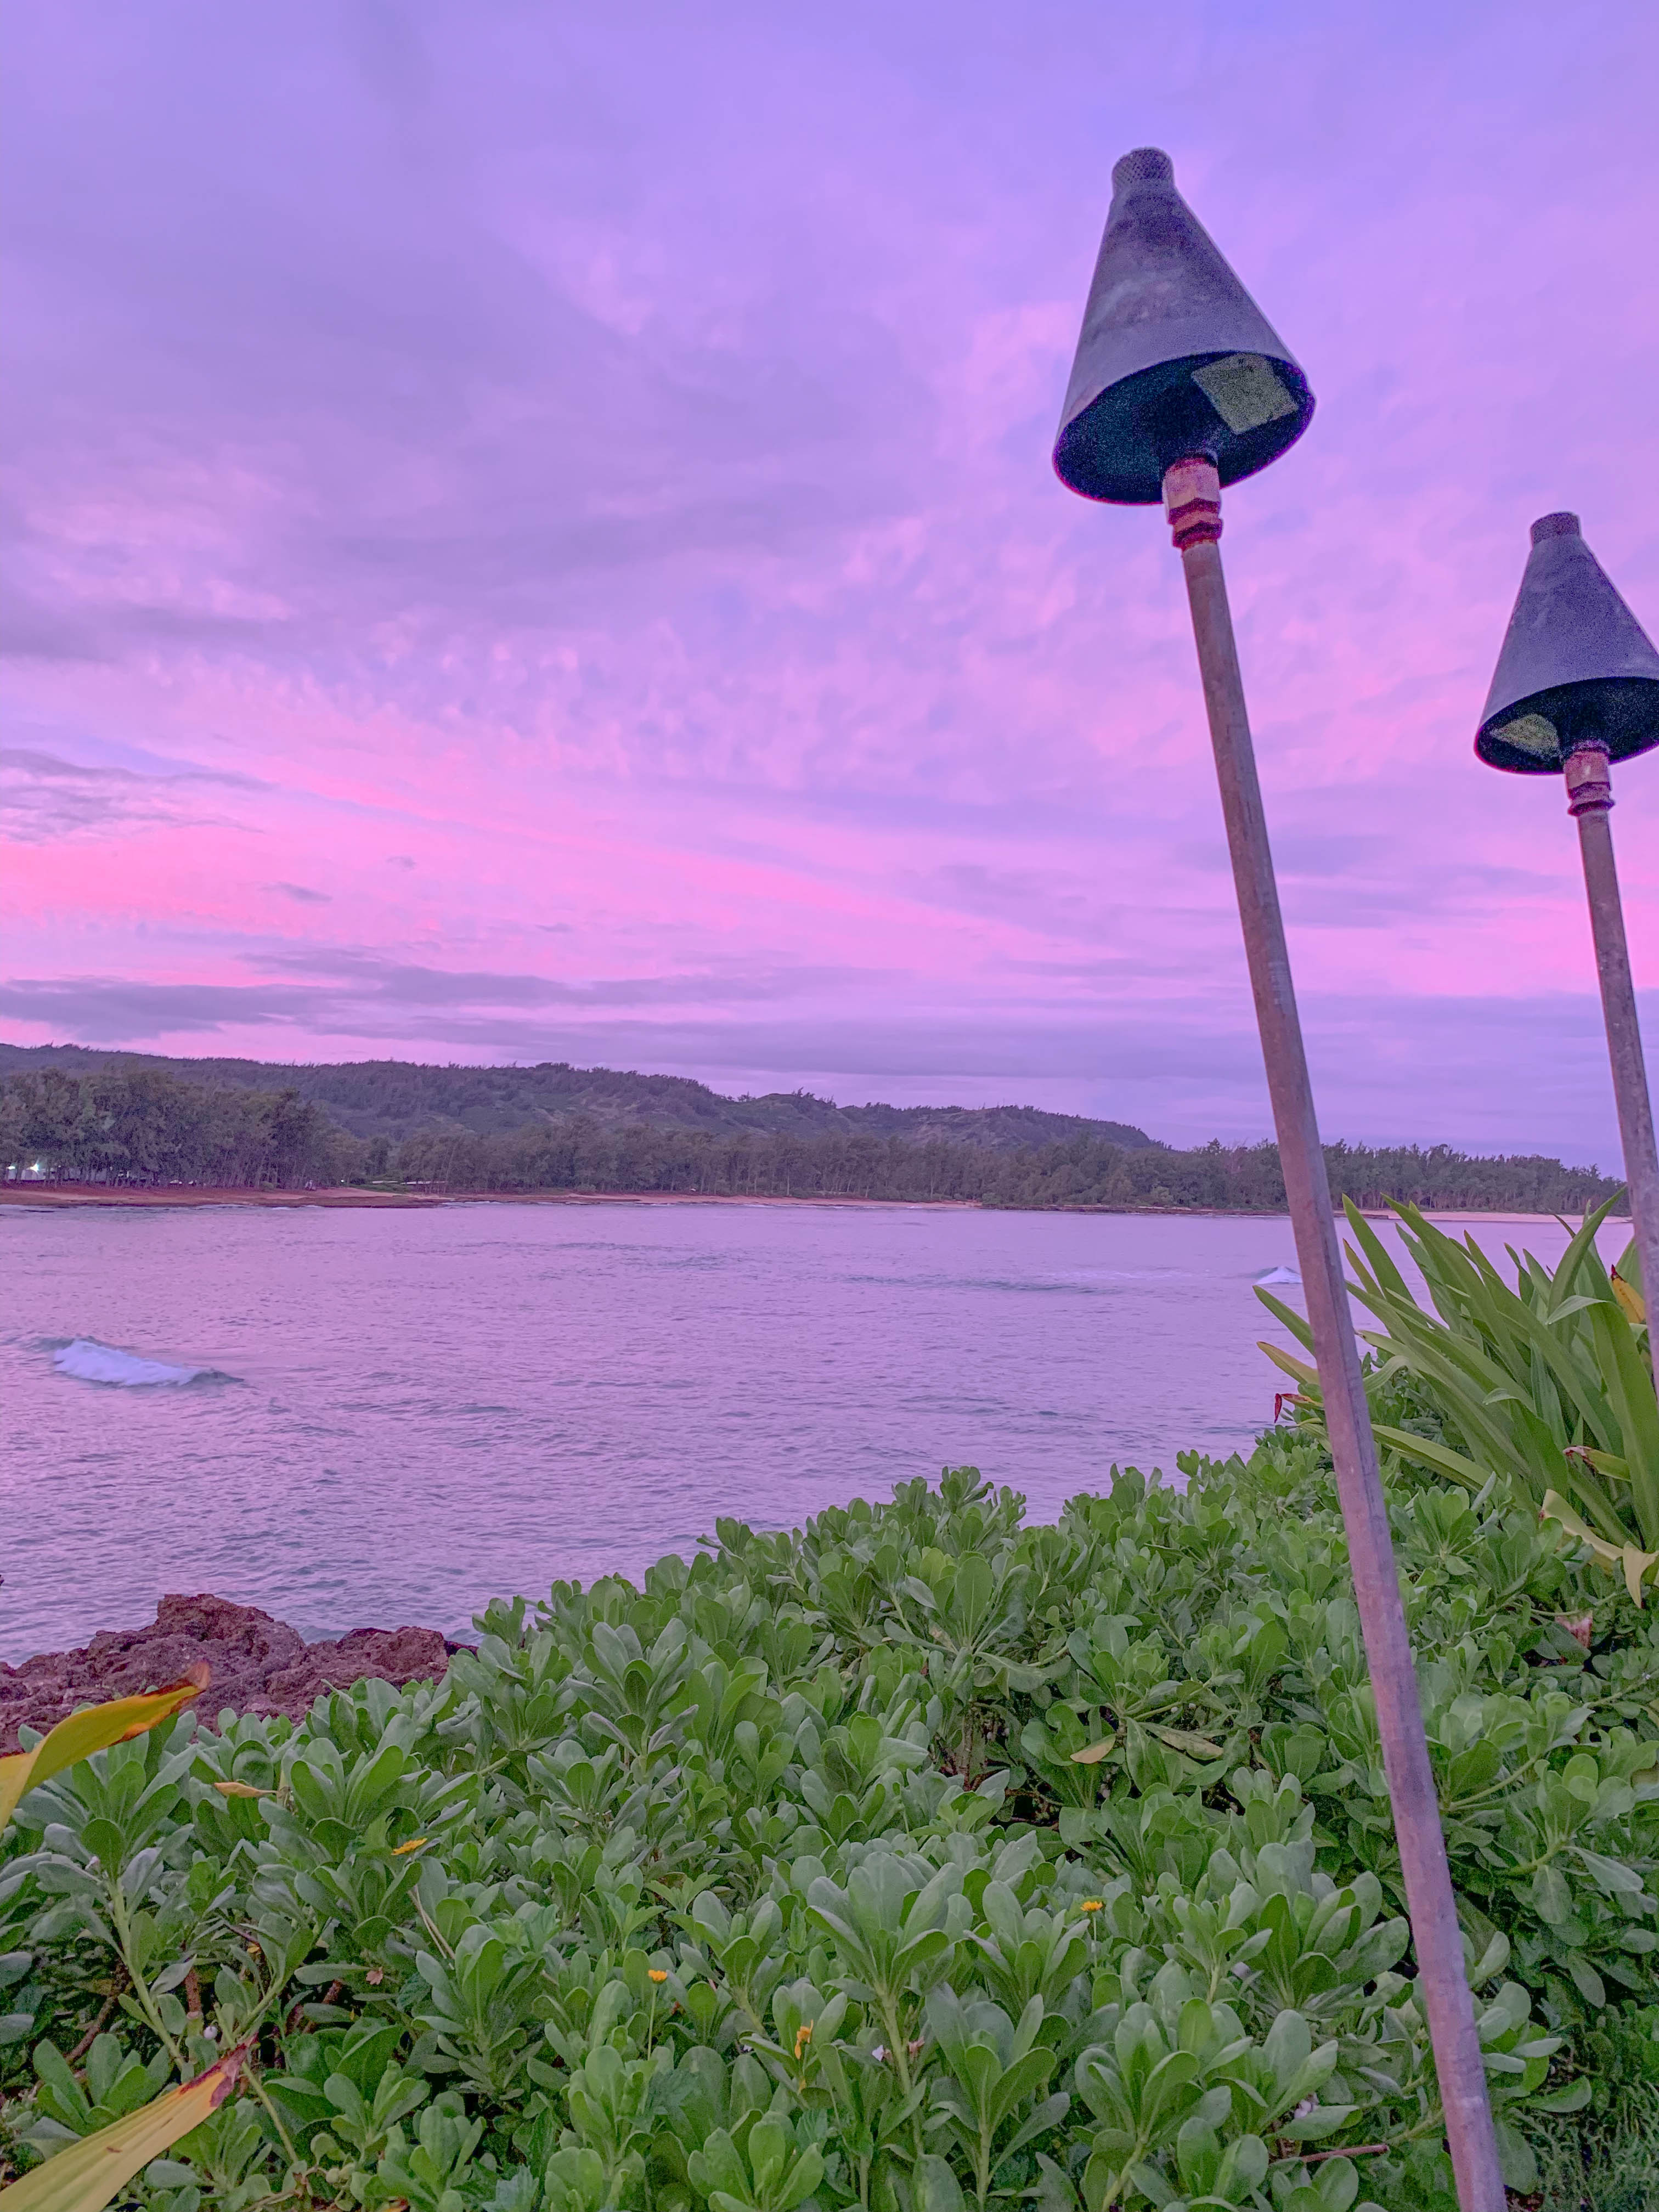 sunrise at turtle bay resort in oahu hawaii